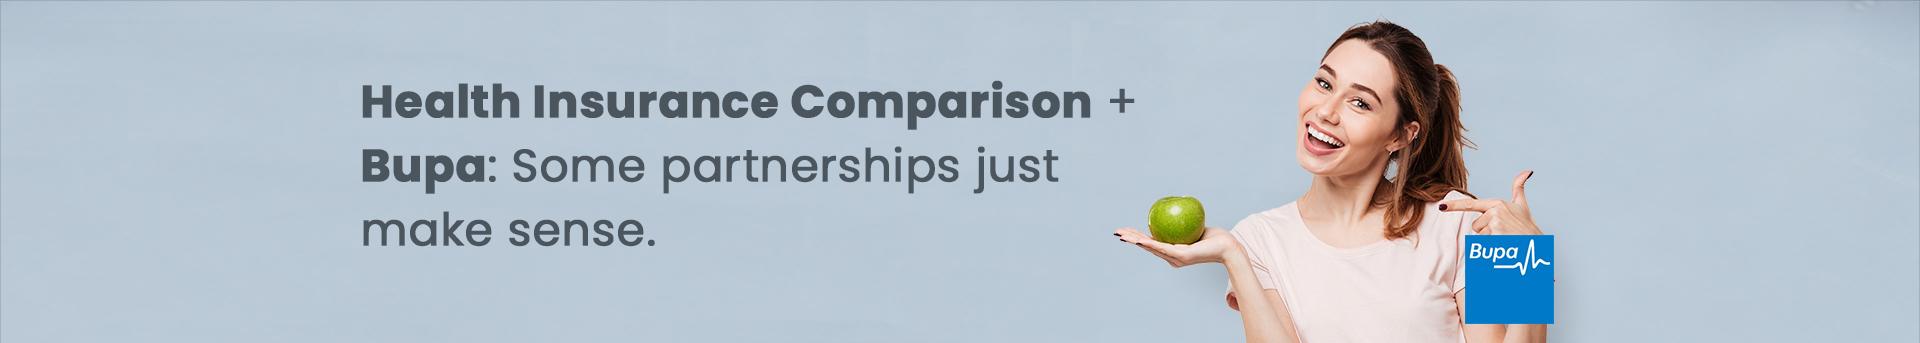 bupa partnership